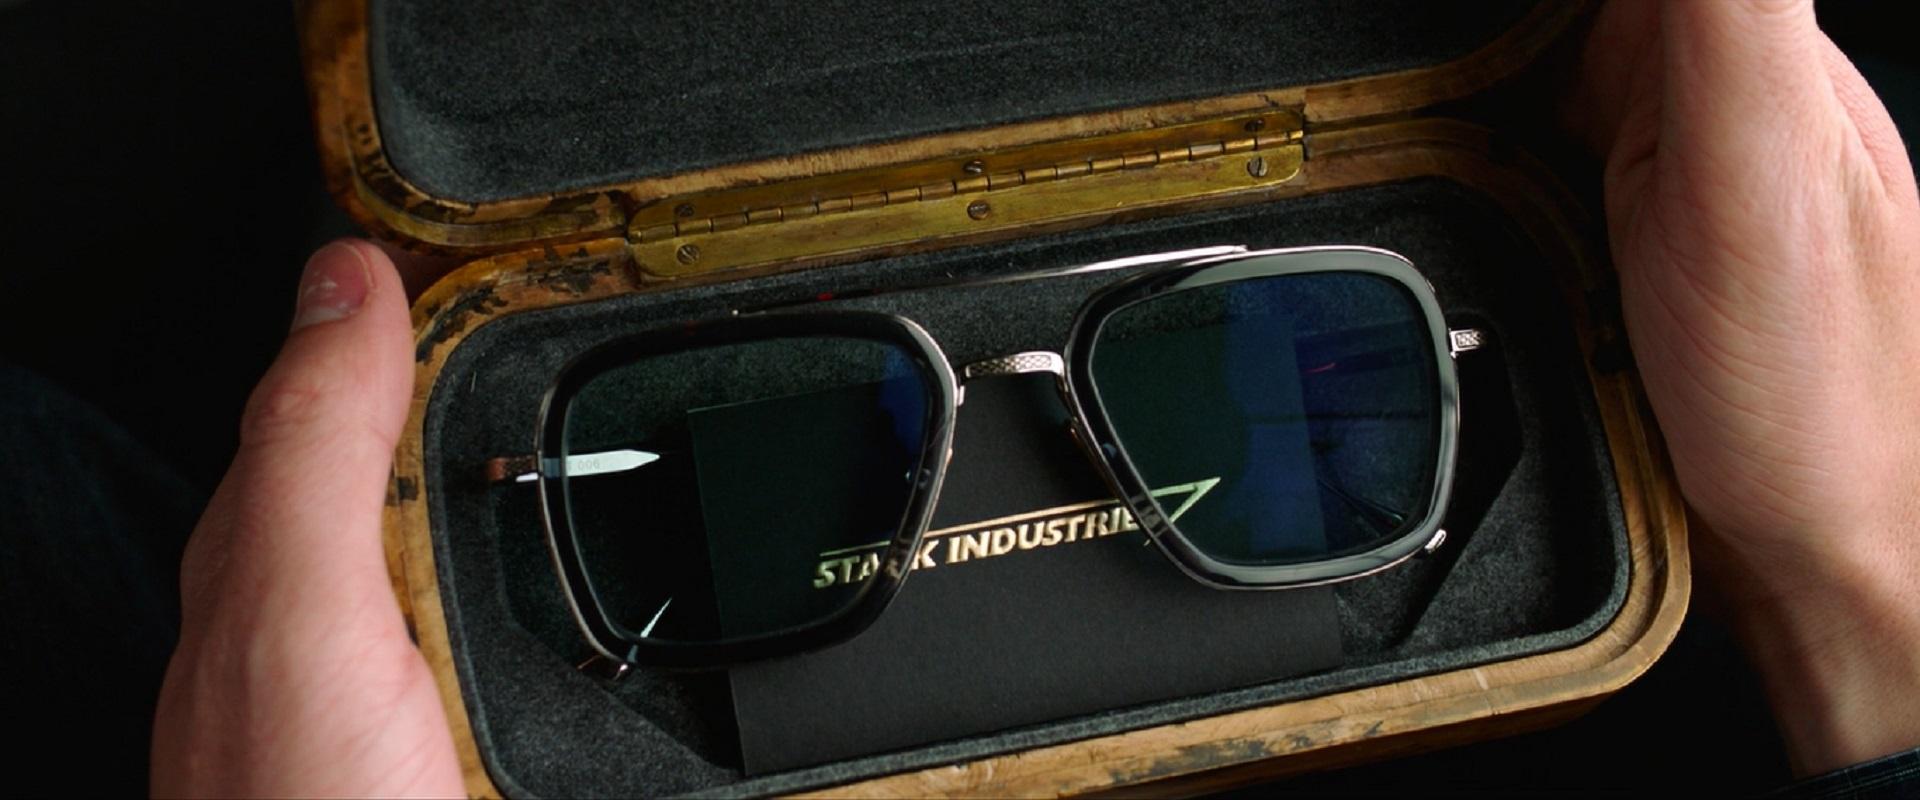 Tony Stark's Glasses